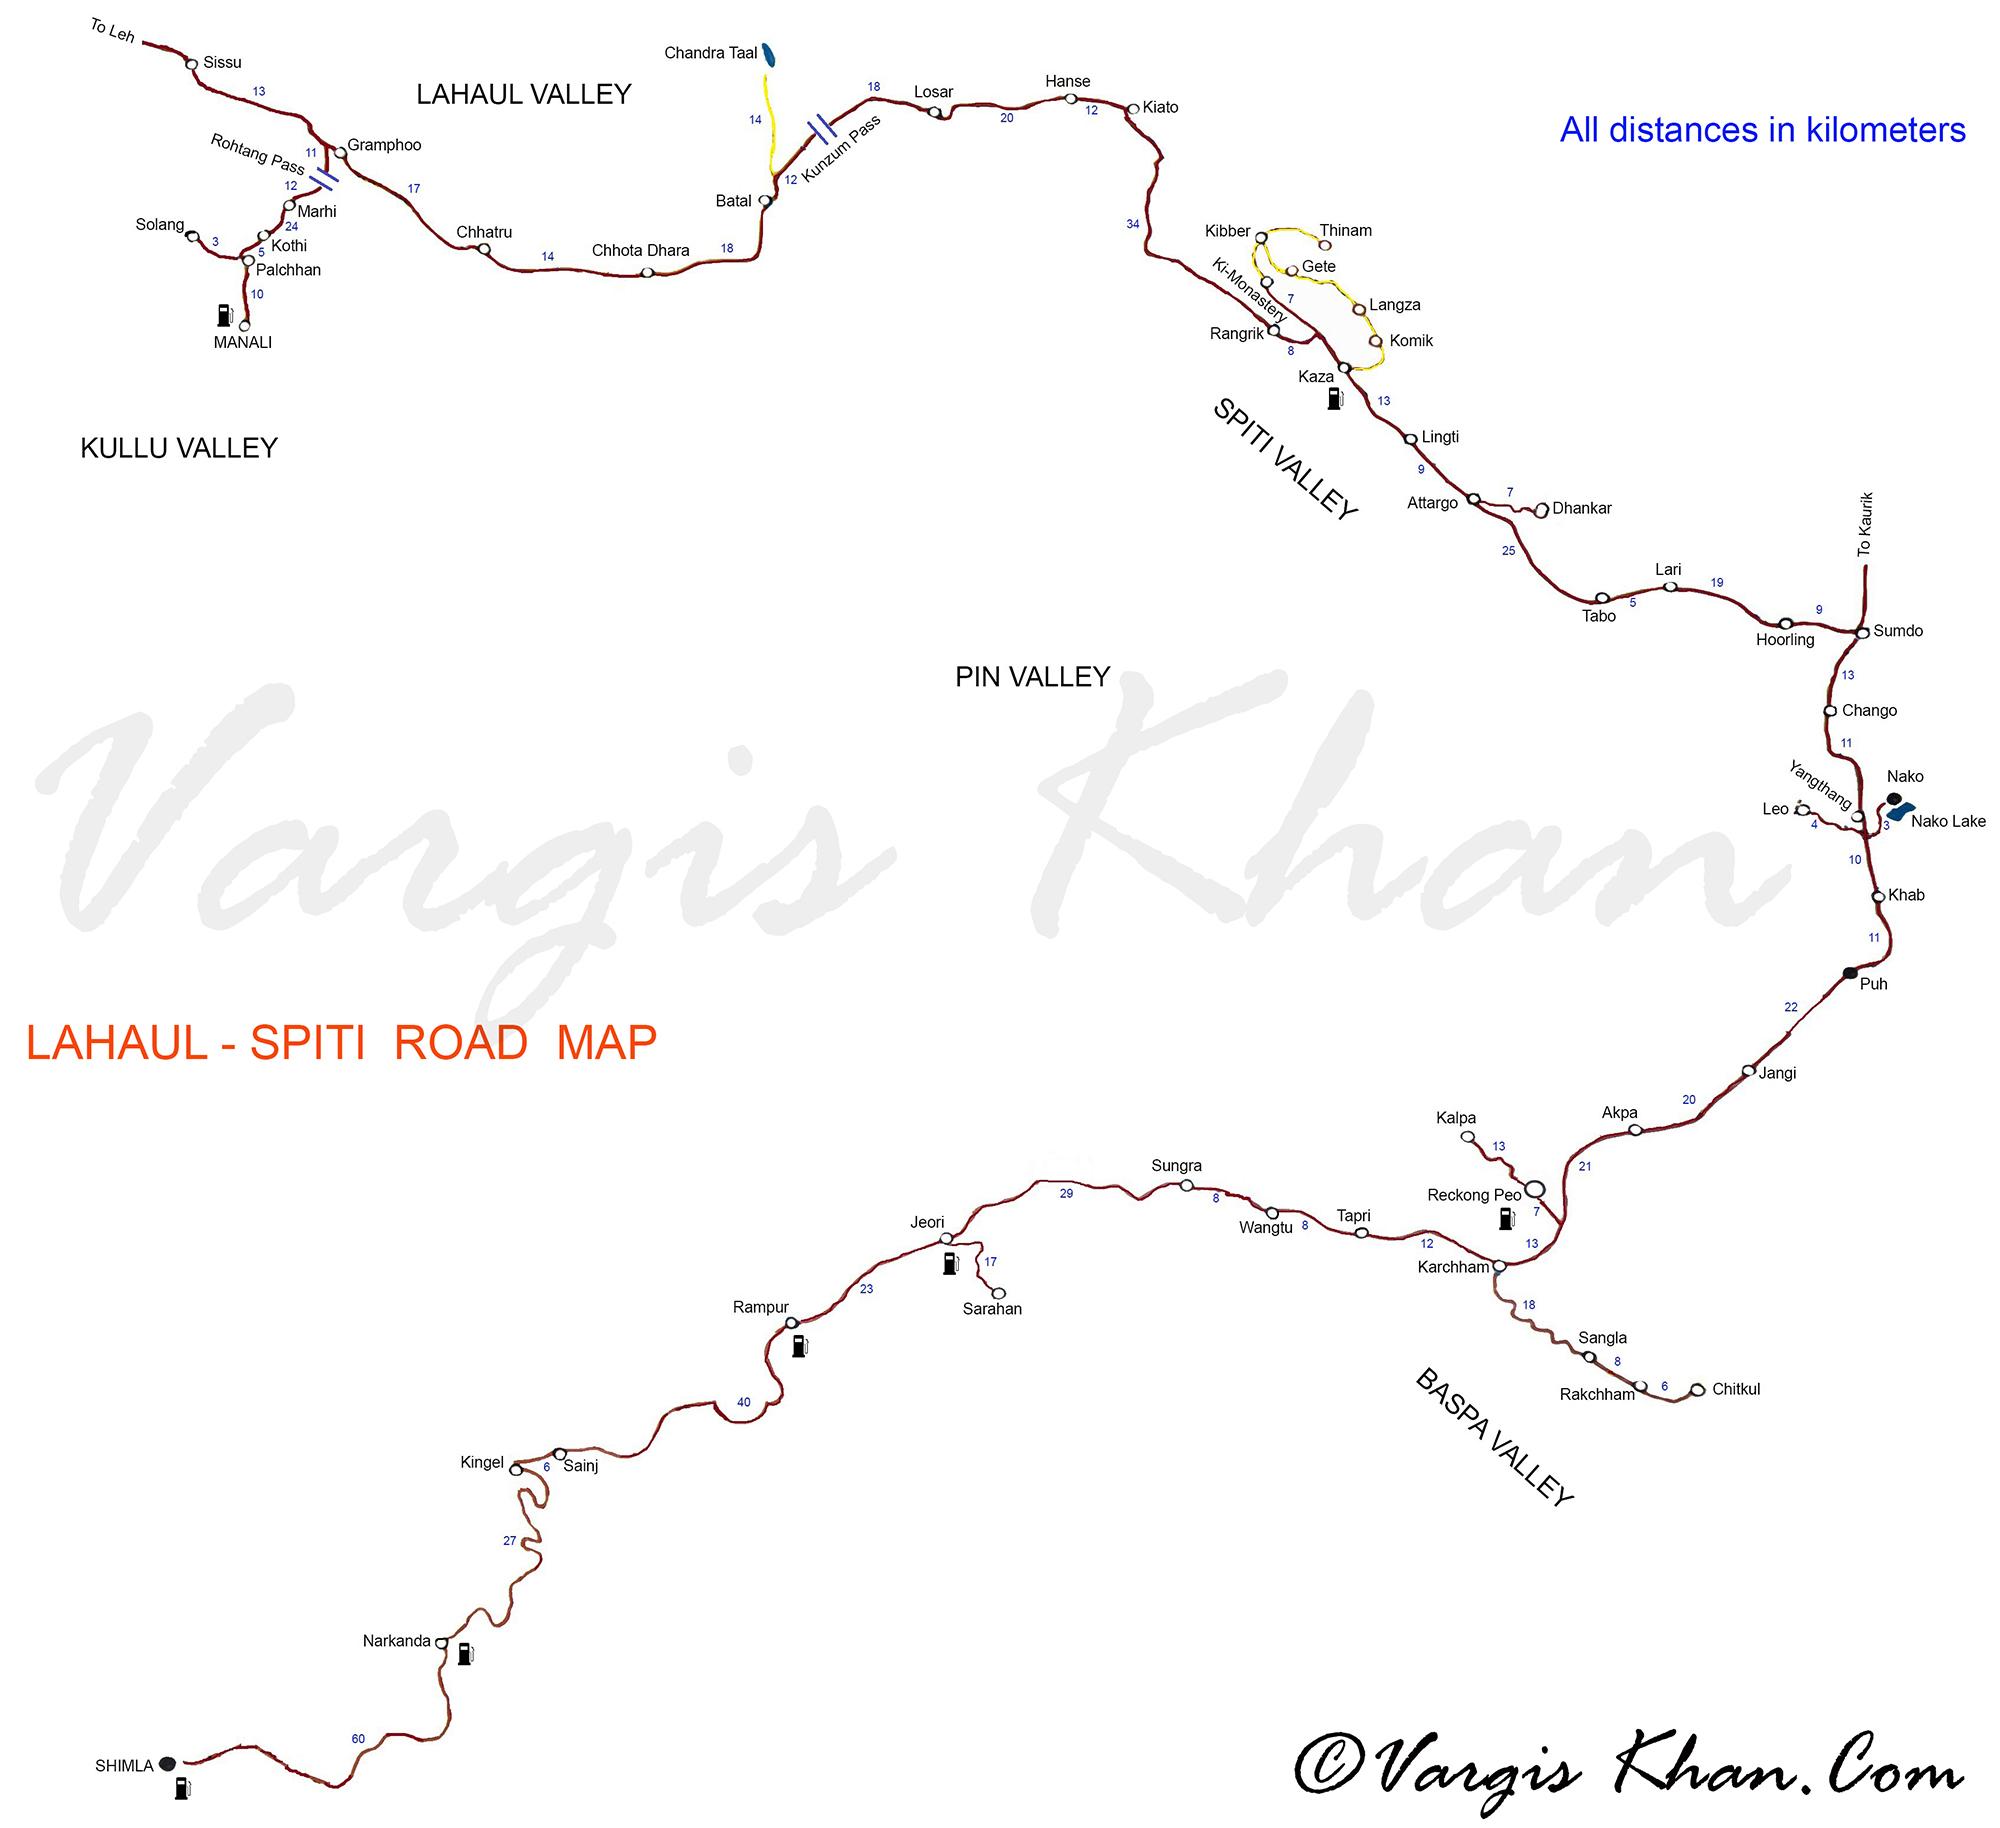 Lahaul Spiti Road Map With Distances Vargis Khan